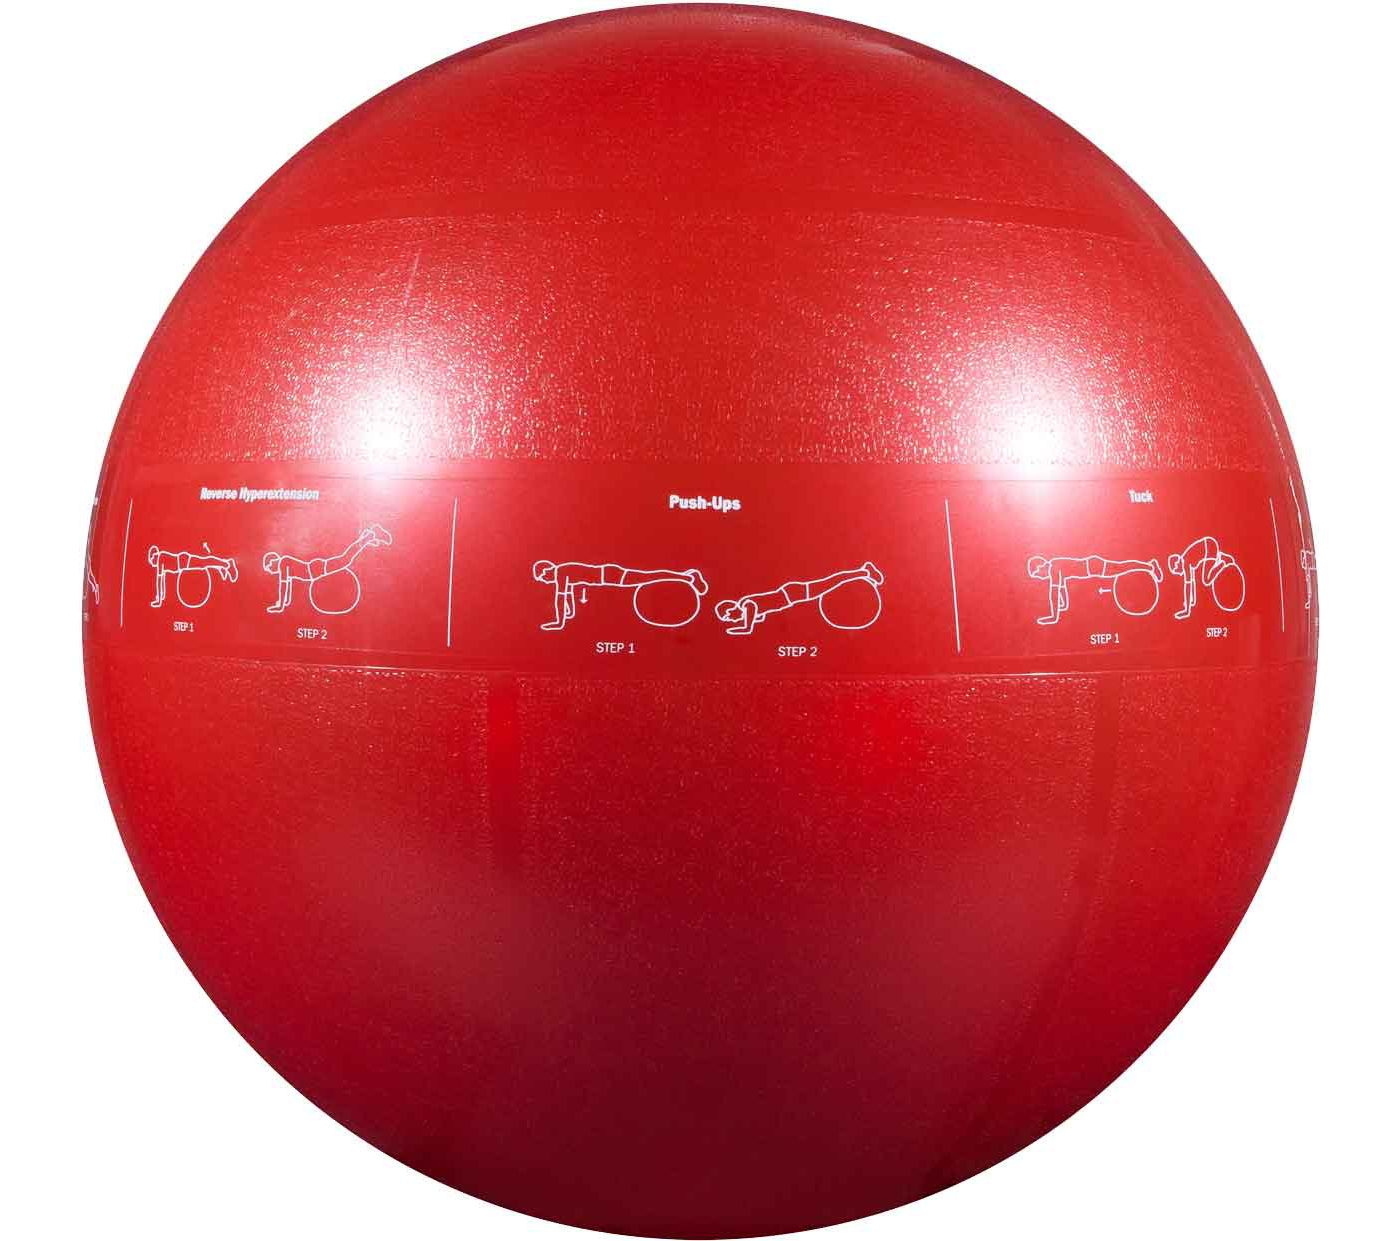 GoFit Pro 65 cm Stability Ball